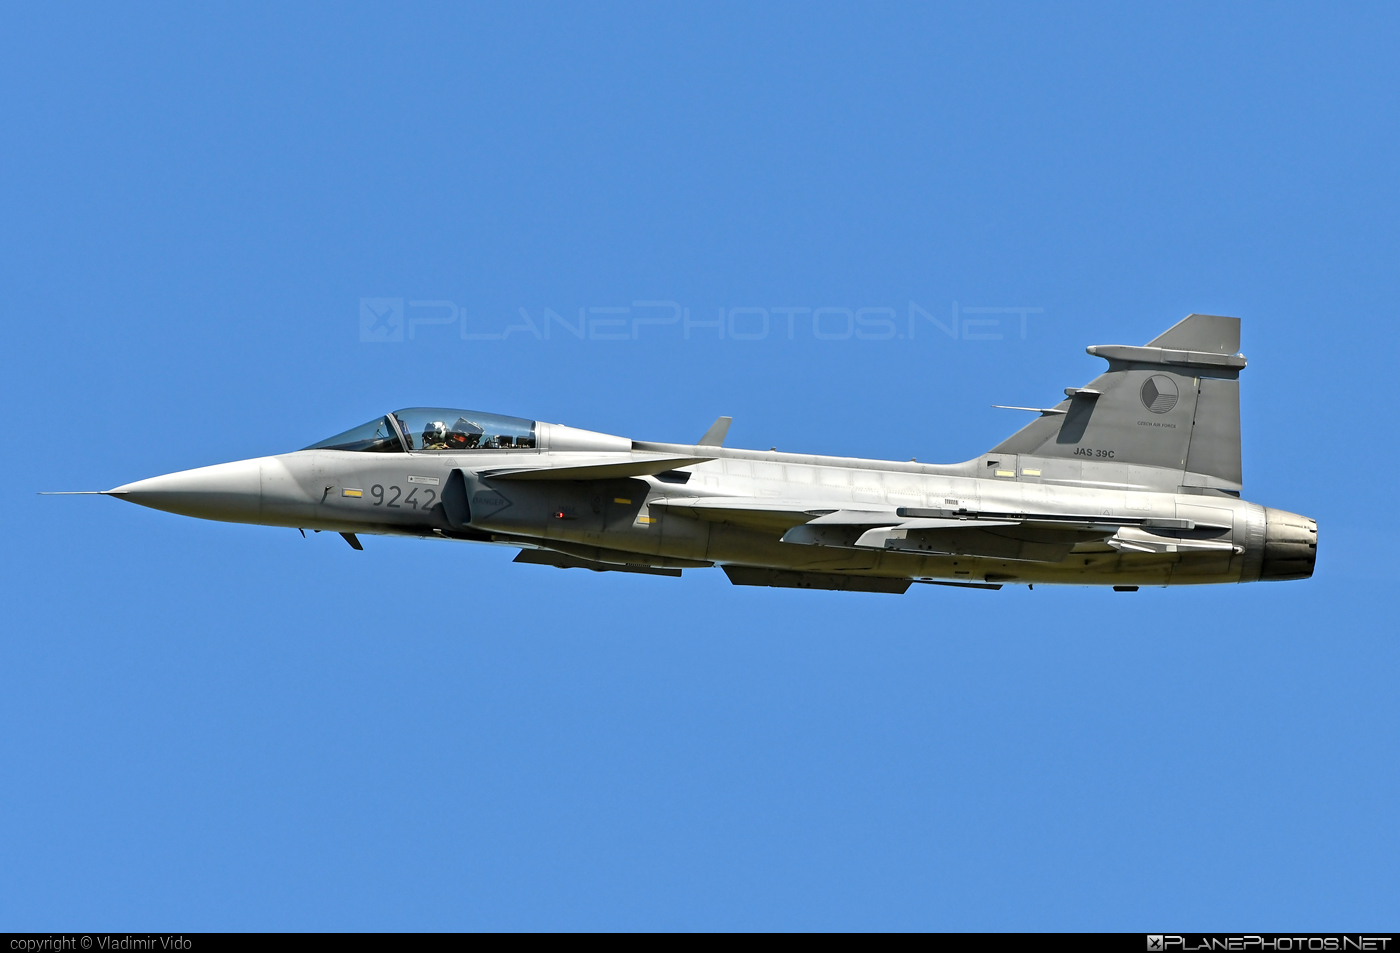 Saab JAS 39C Gripen - 9242 operated by Vzdušné síly AČR (Czech Air Force) #czechairforce #gripen #jas39 #jas39c #jas39gripen #saab #vzdusnesilyacr